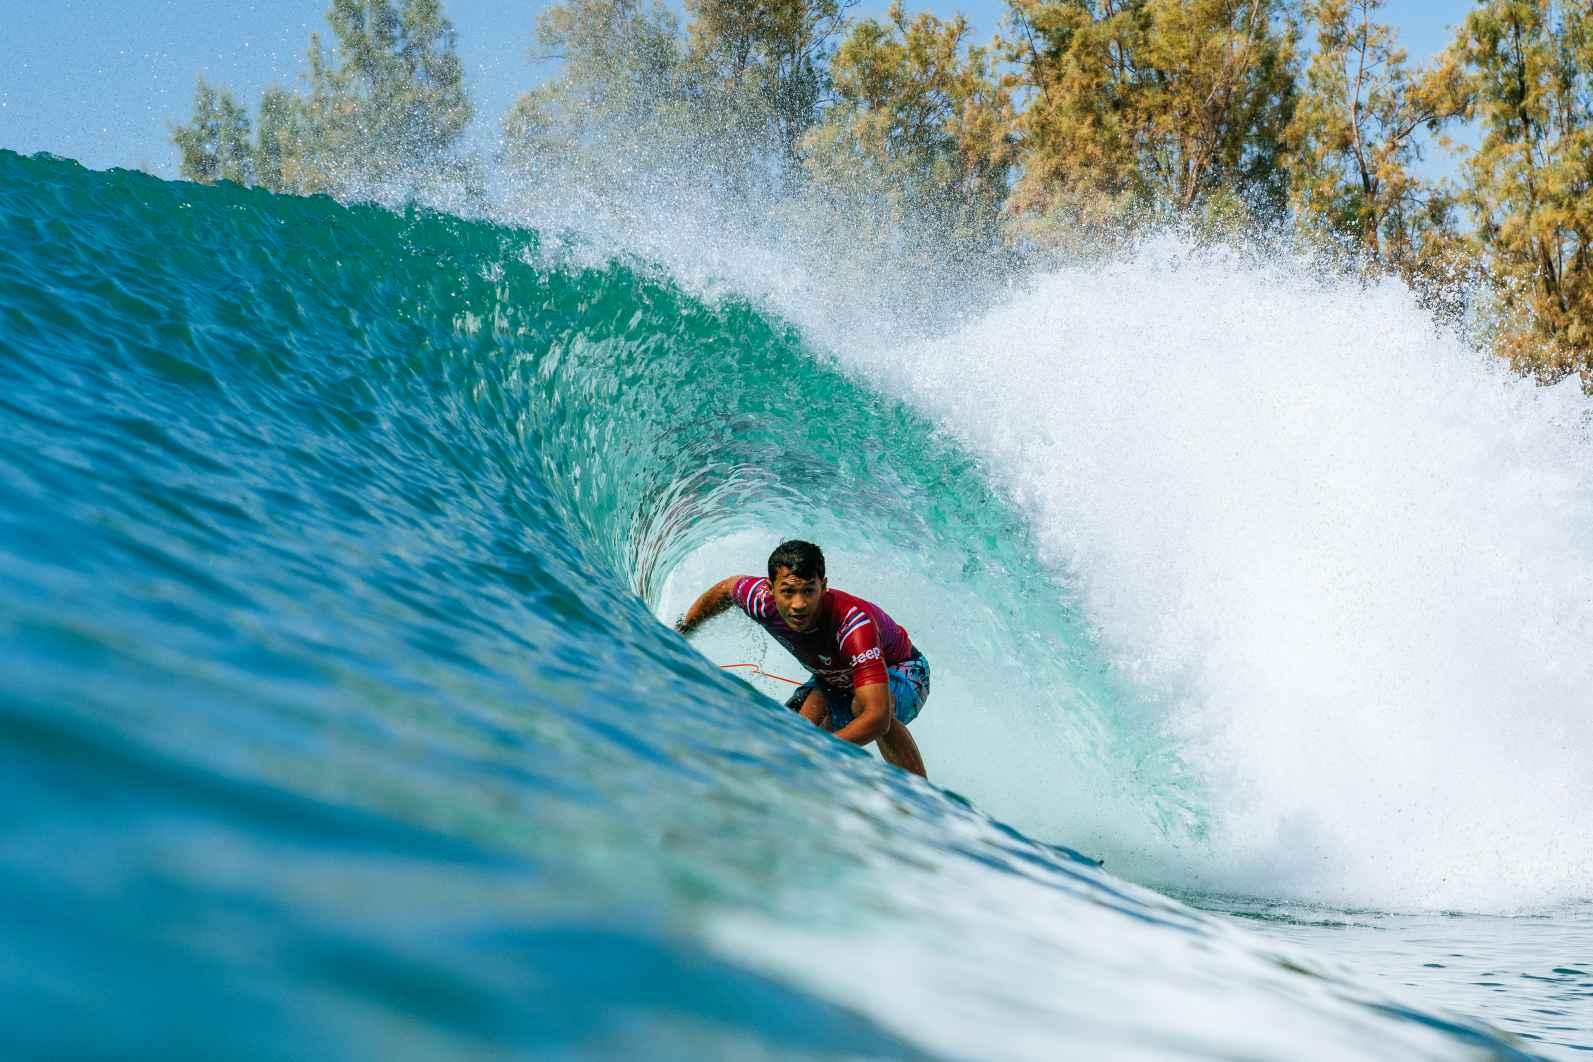 surf30 surf ranch pro 2021 wsl surf Moniz S Ranch21 PNN 2161